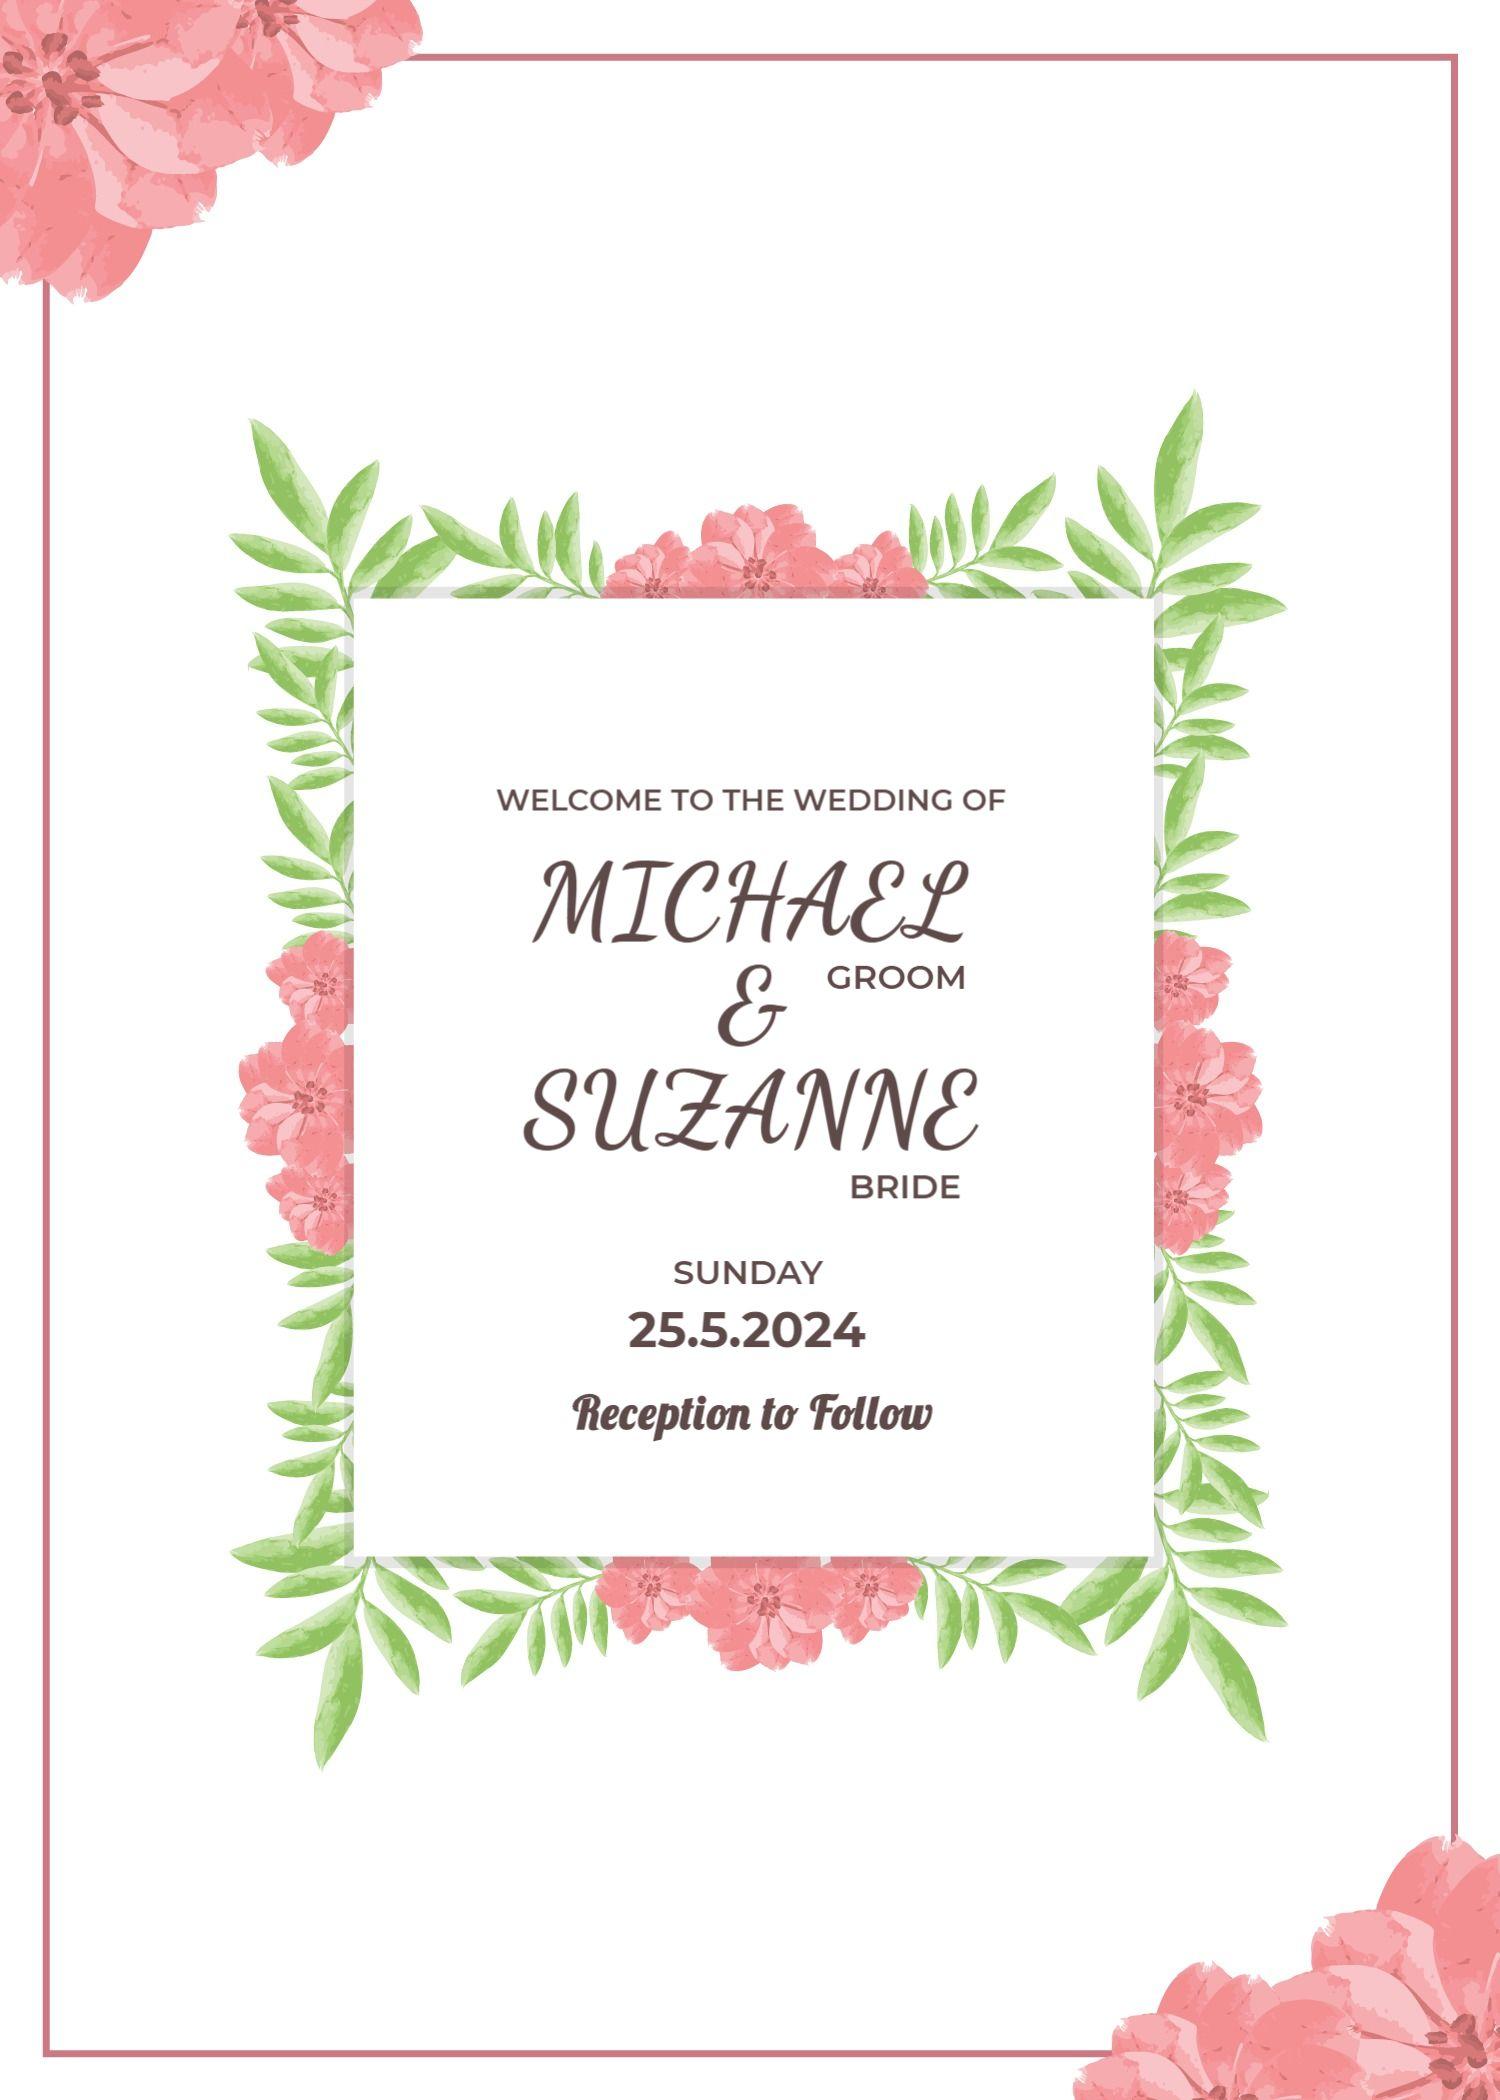 Colorful Wedding Invitation Template - Portrait Frame